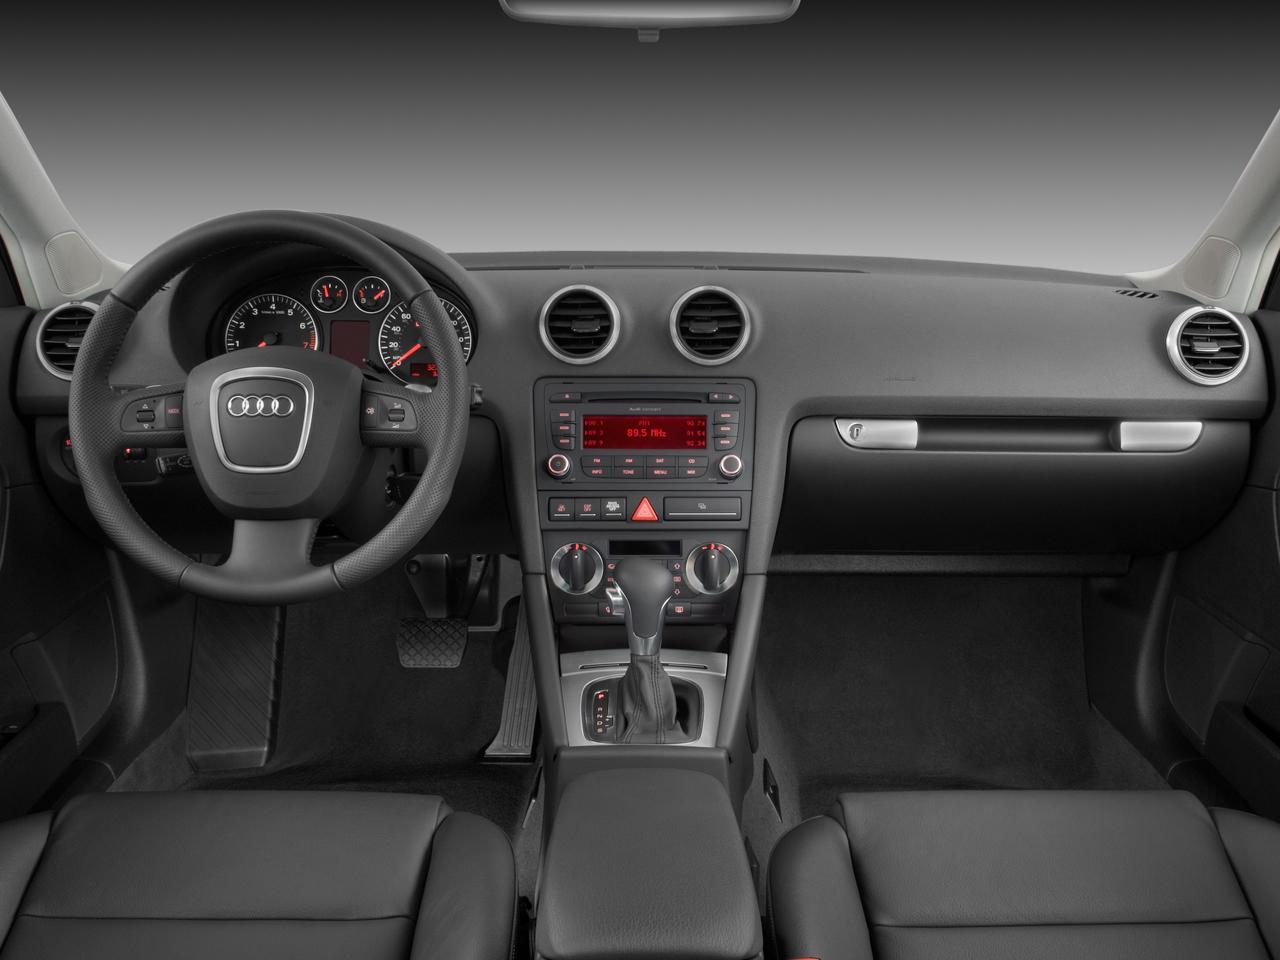 2008 audi a3 tdi clubsport quattro concept latest news features rh automobilemag com 2015 Audi A3 Dash 2015 Audi A3 Dash